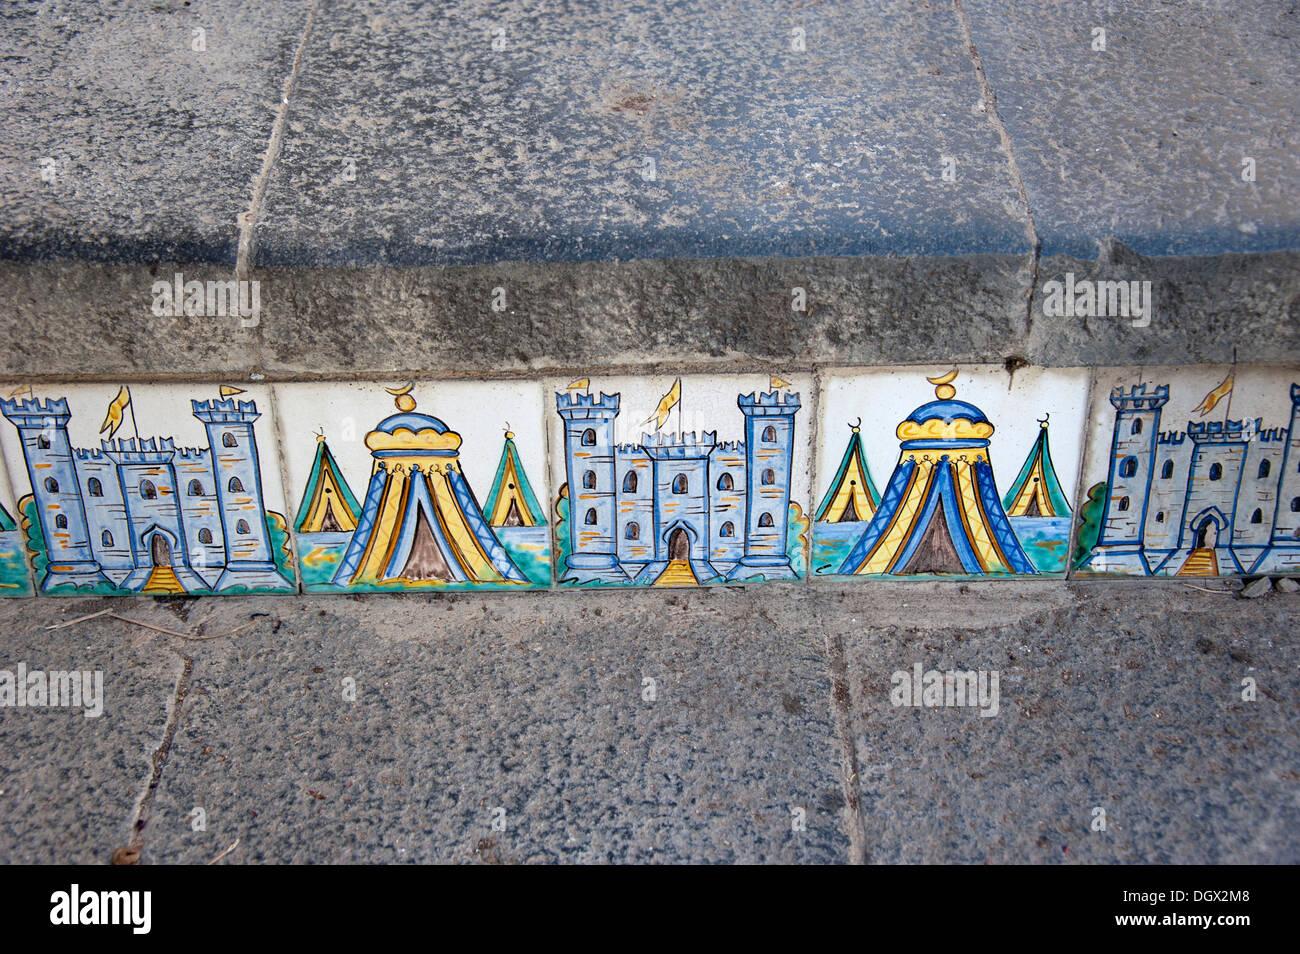 Stair with ceramic tiles, majolicas, Santa Maria del Monte, Caltagirone, Catania, Sicily, Italy, Europe - Stock Image